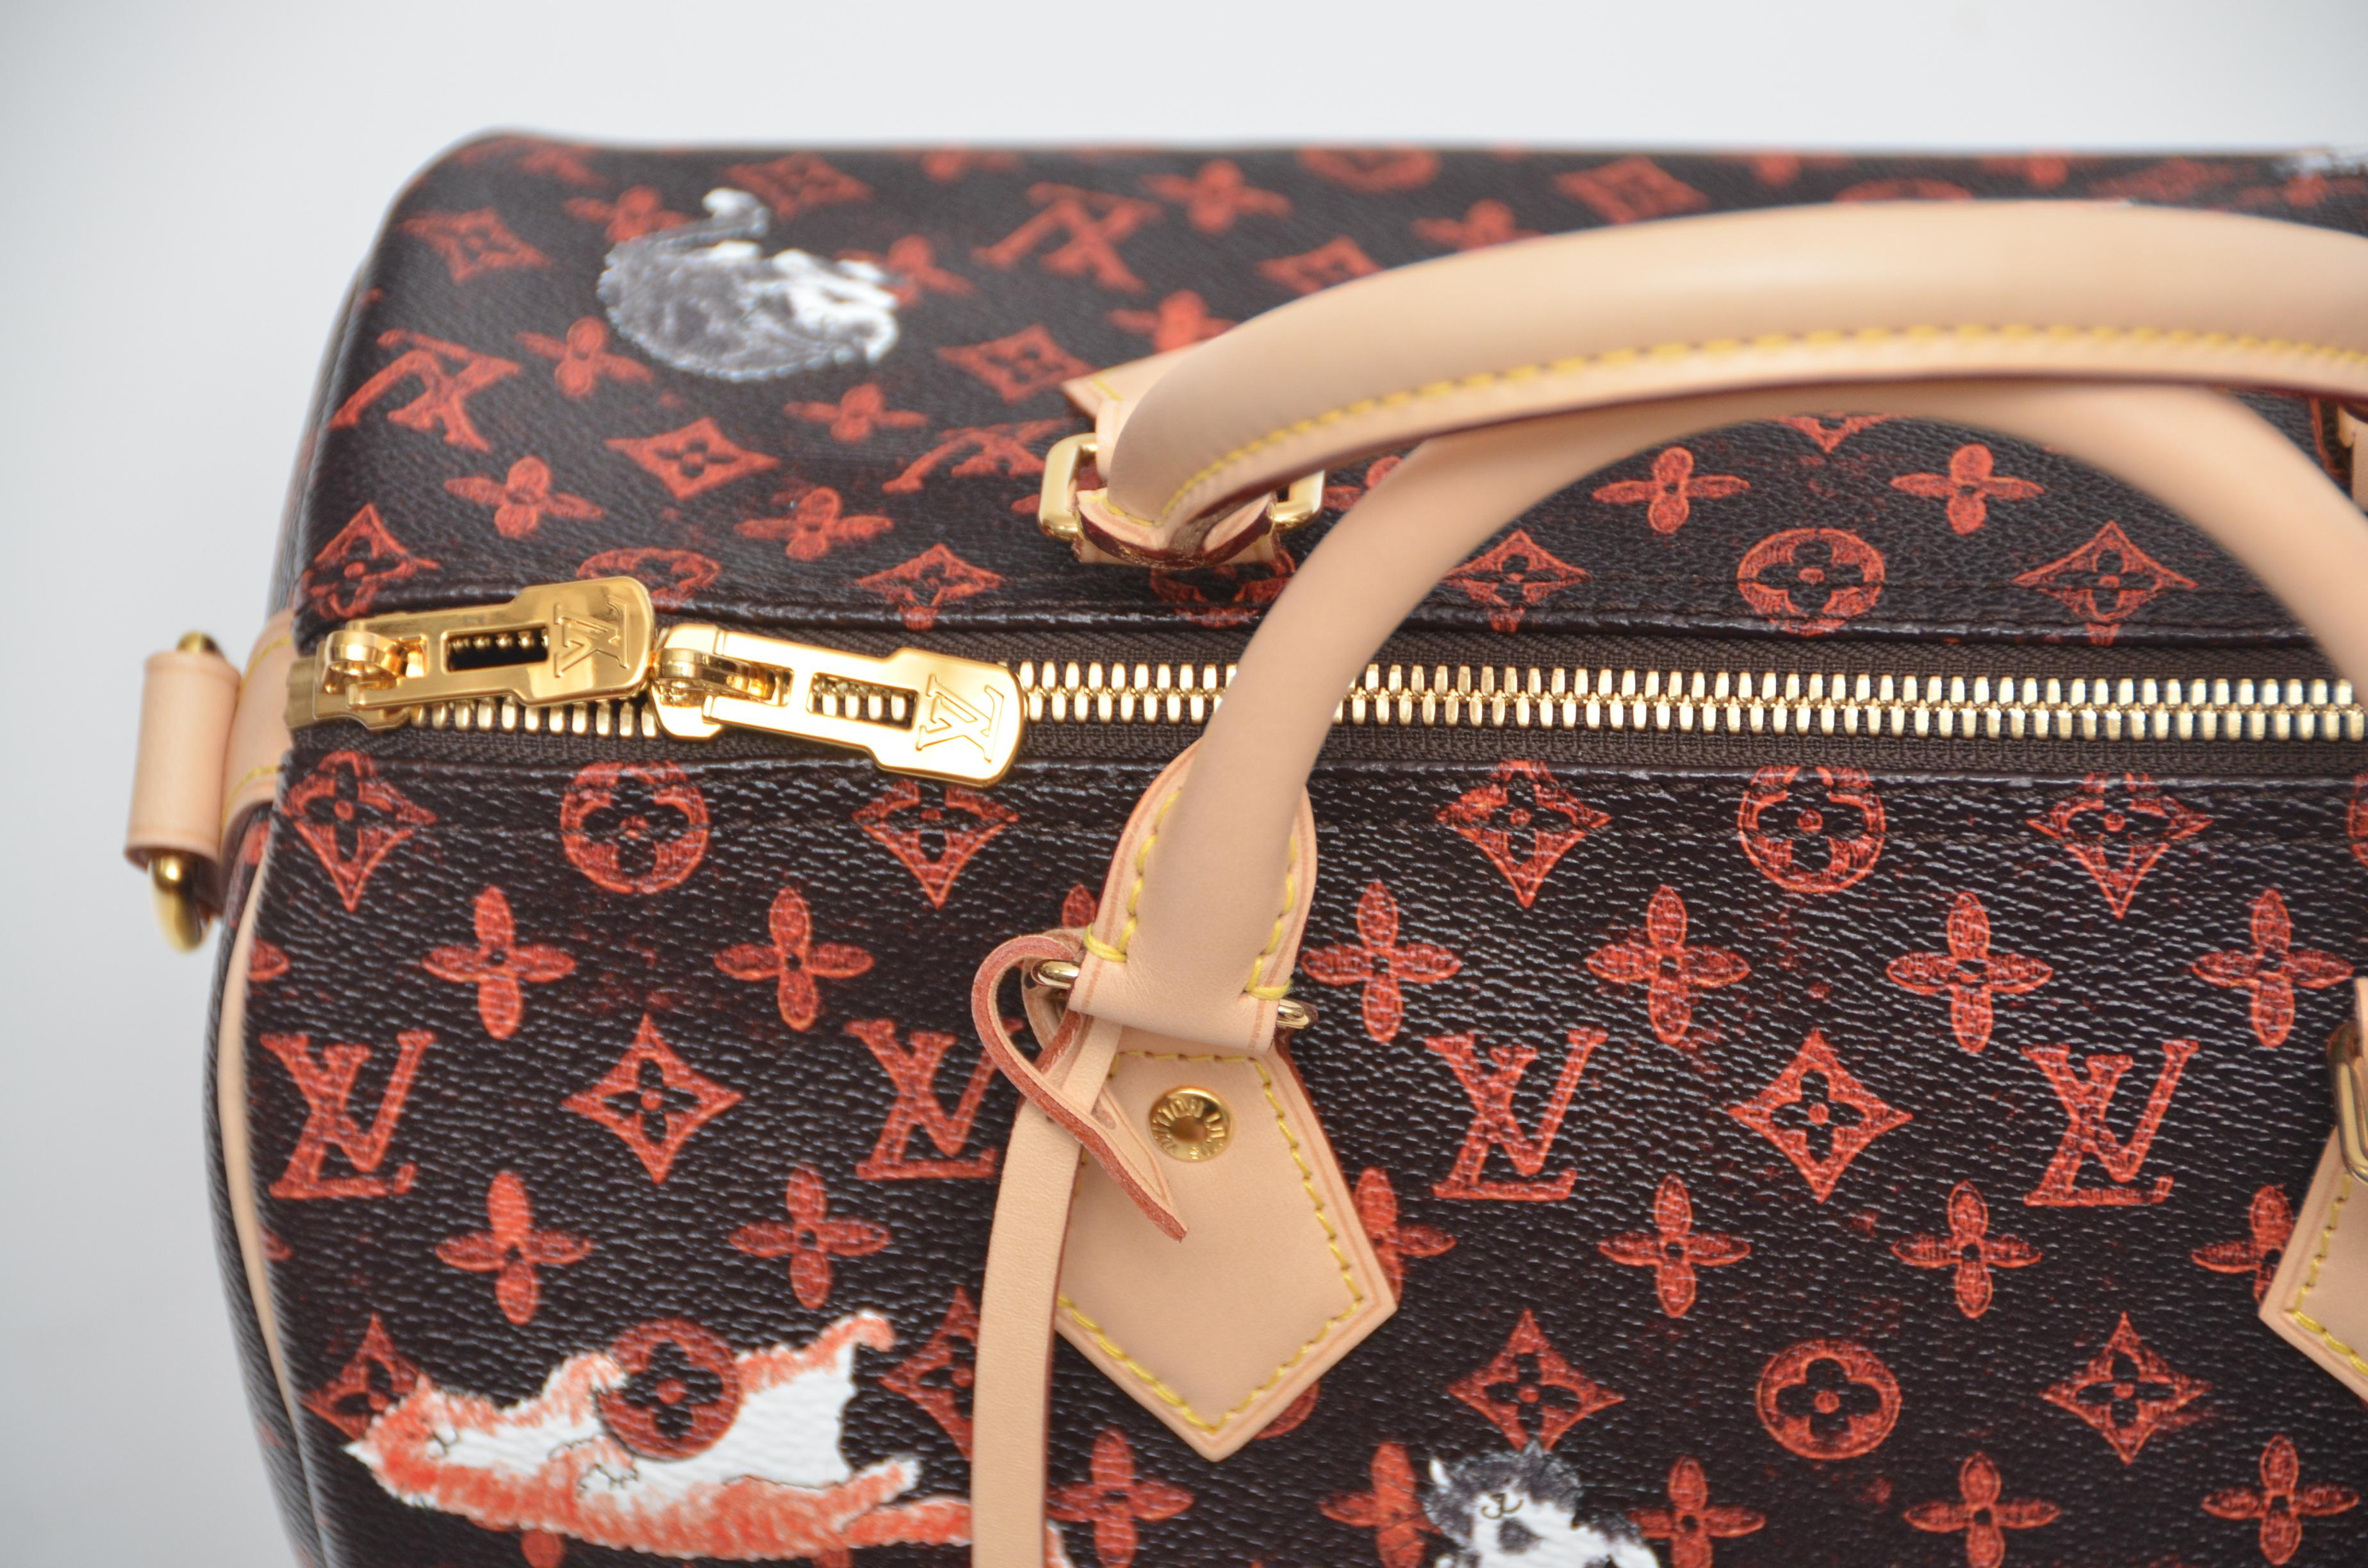 ce944f318201 LOUIS VUITTON Catogram Bag Speedy 30 Grace Coddington New For Sale at  1stdibs